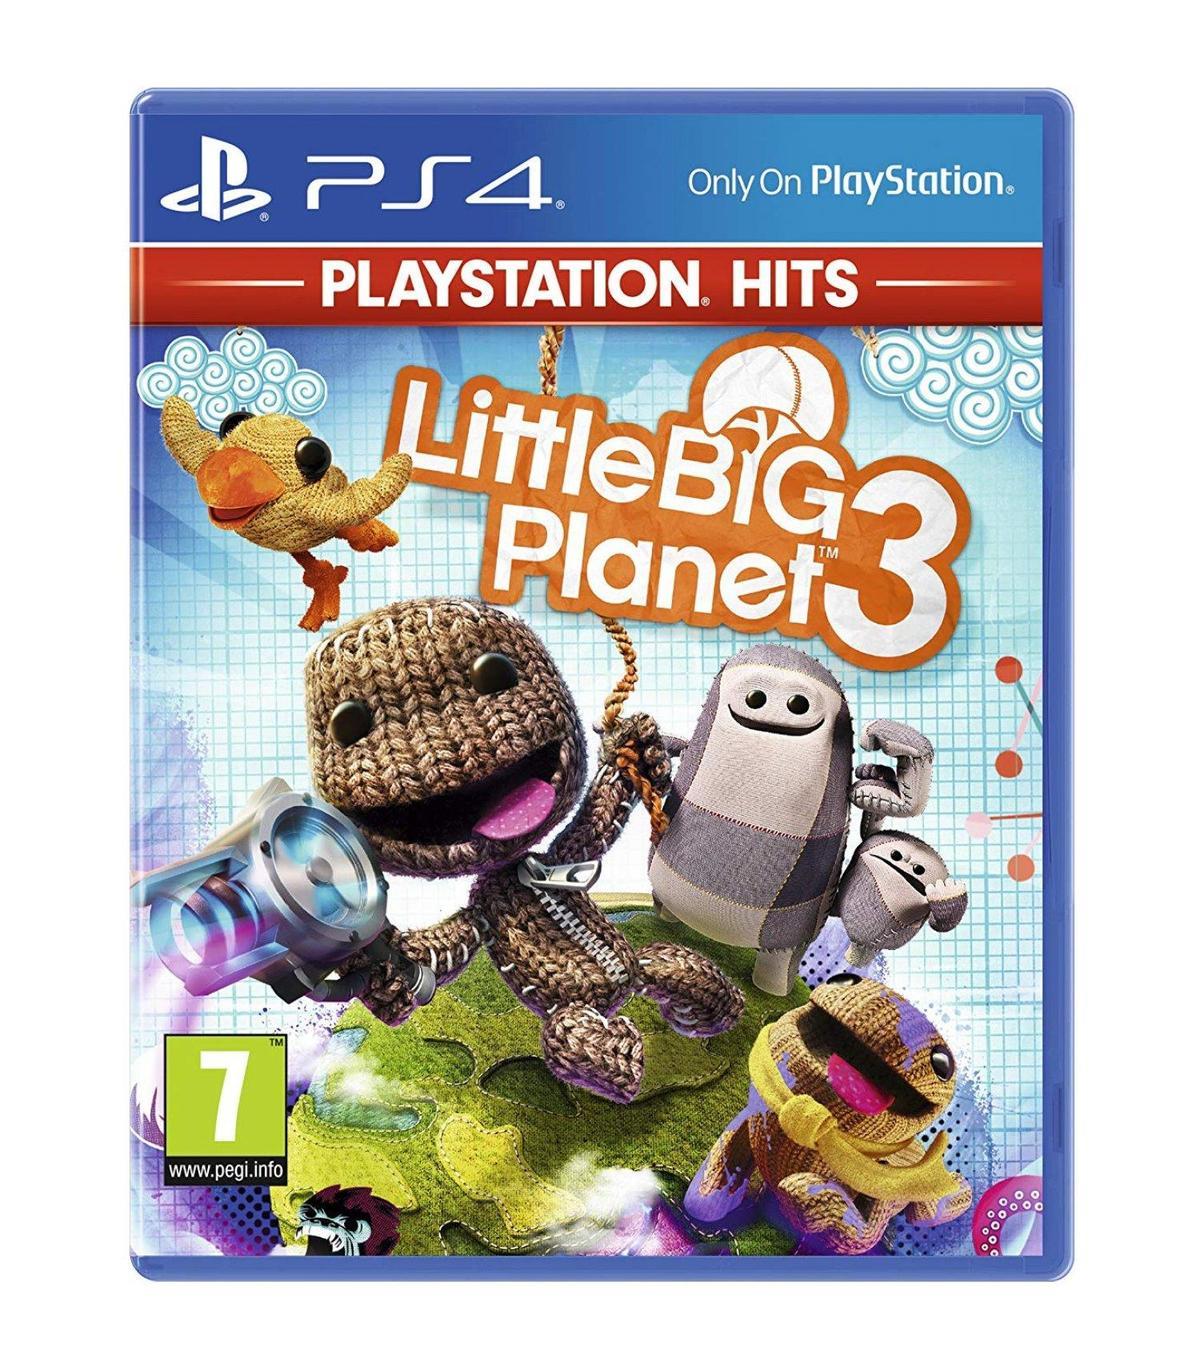 LittleBig Planet 3 (Playstation Hits) (Nordic)